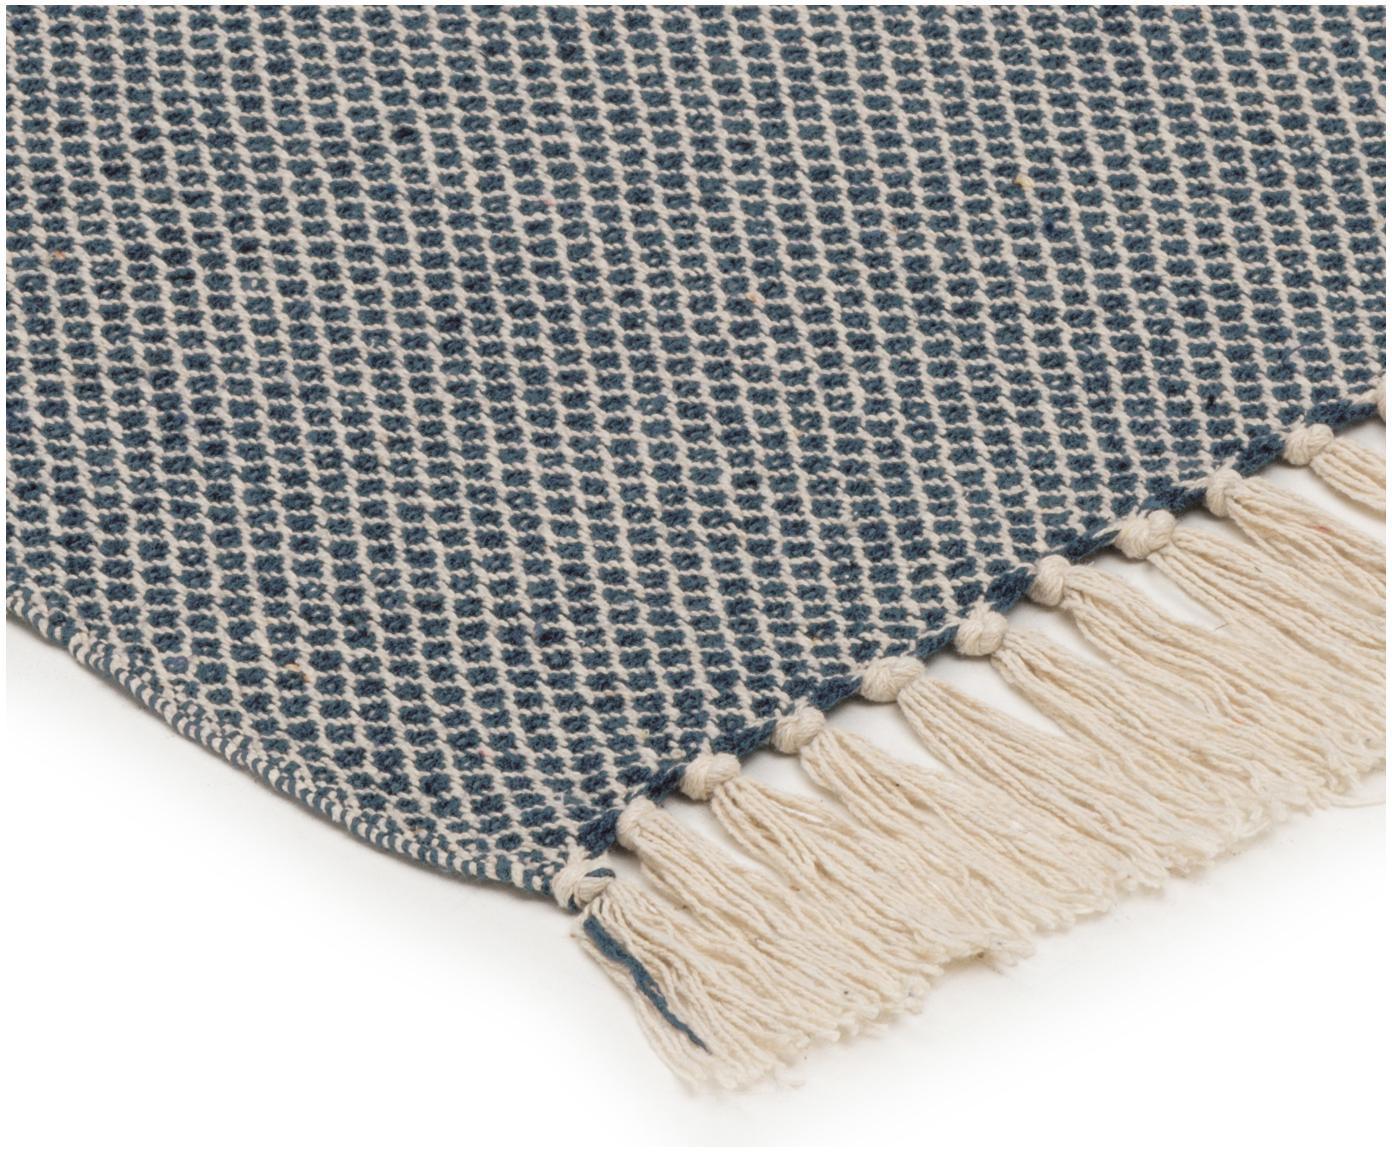 Plaid Thea, 58%katoen,22%polyester, 12%acryl,4%rayon,4%nylon, Donker marineblauw, lichtbeige, 130 x 160 cm